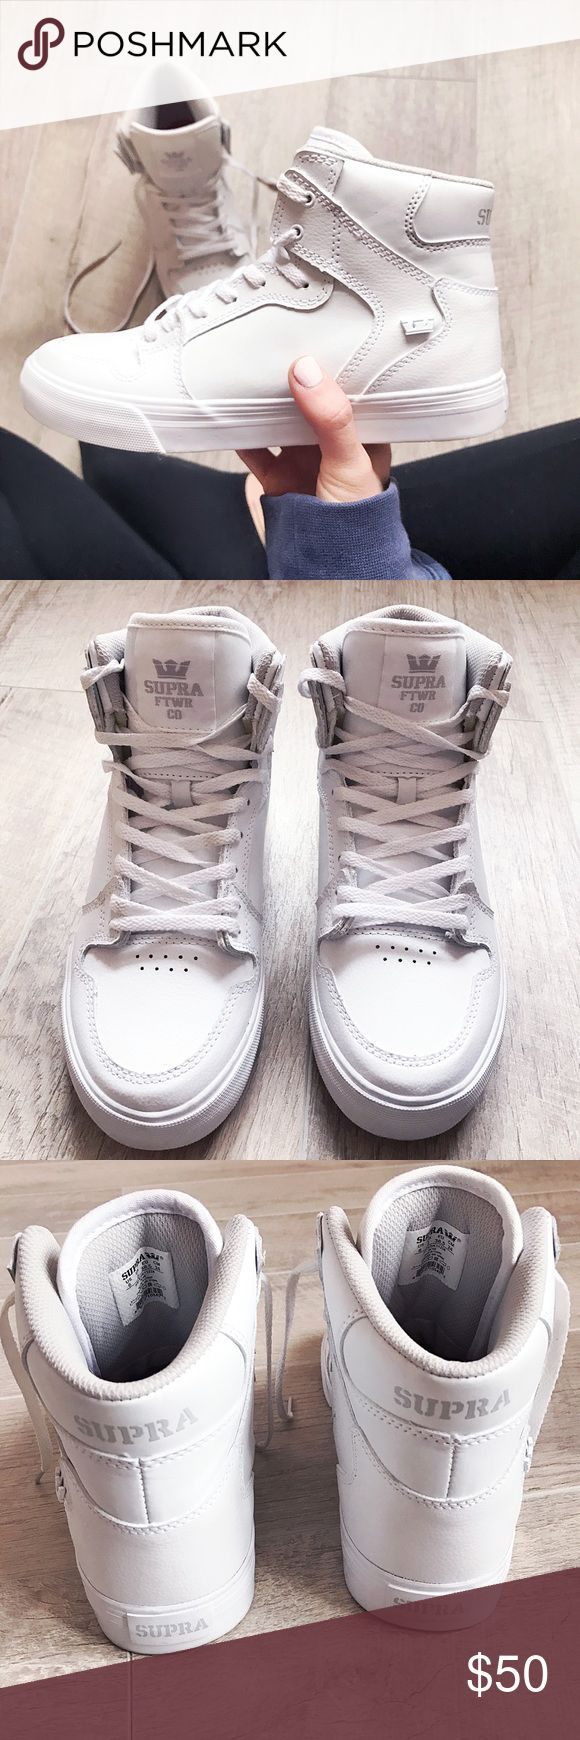 Adidas skate shoes zumiez - Supra High Tops From Zumiez